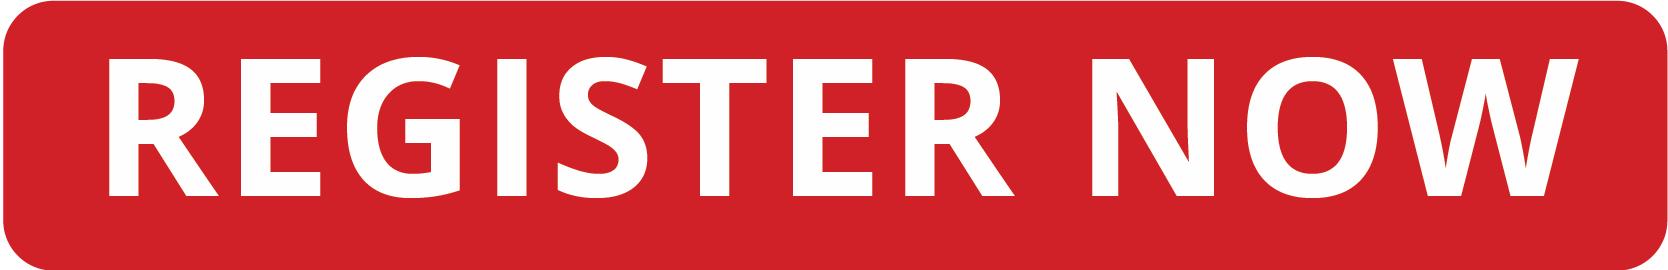 2018 Egypt Refineries Modernization Registration button 1-07